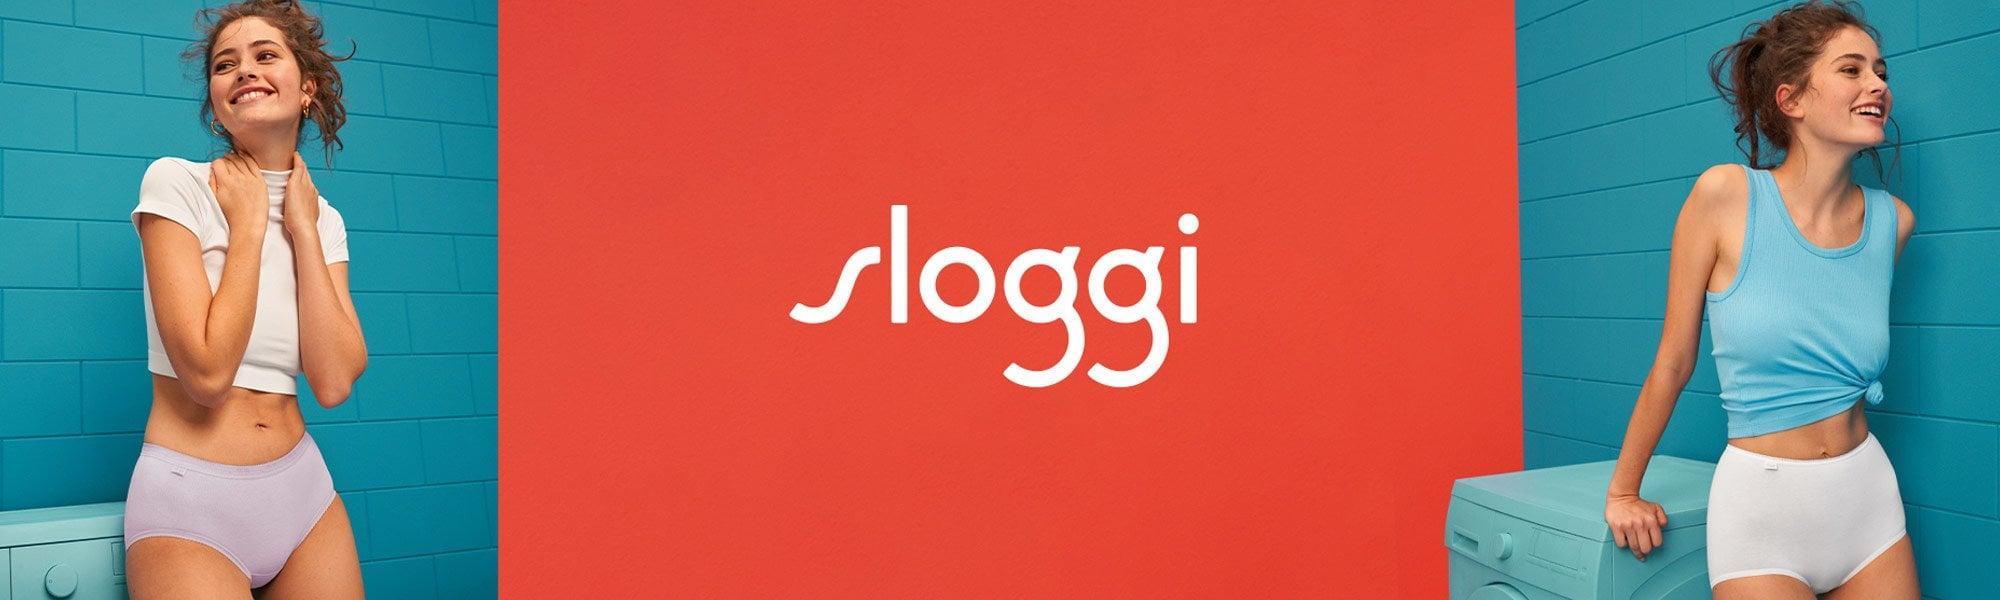 SLOGGI NEW ARRIVALS